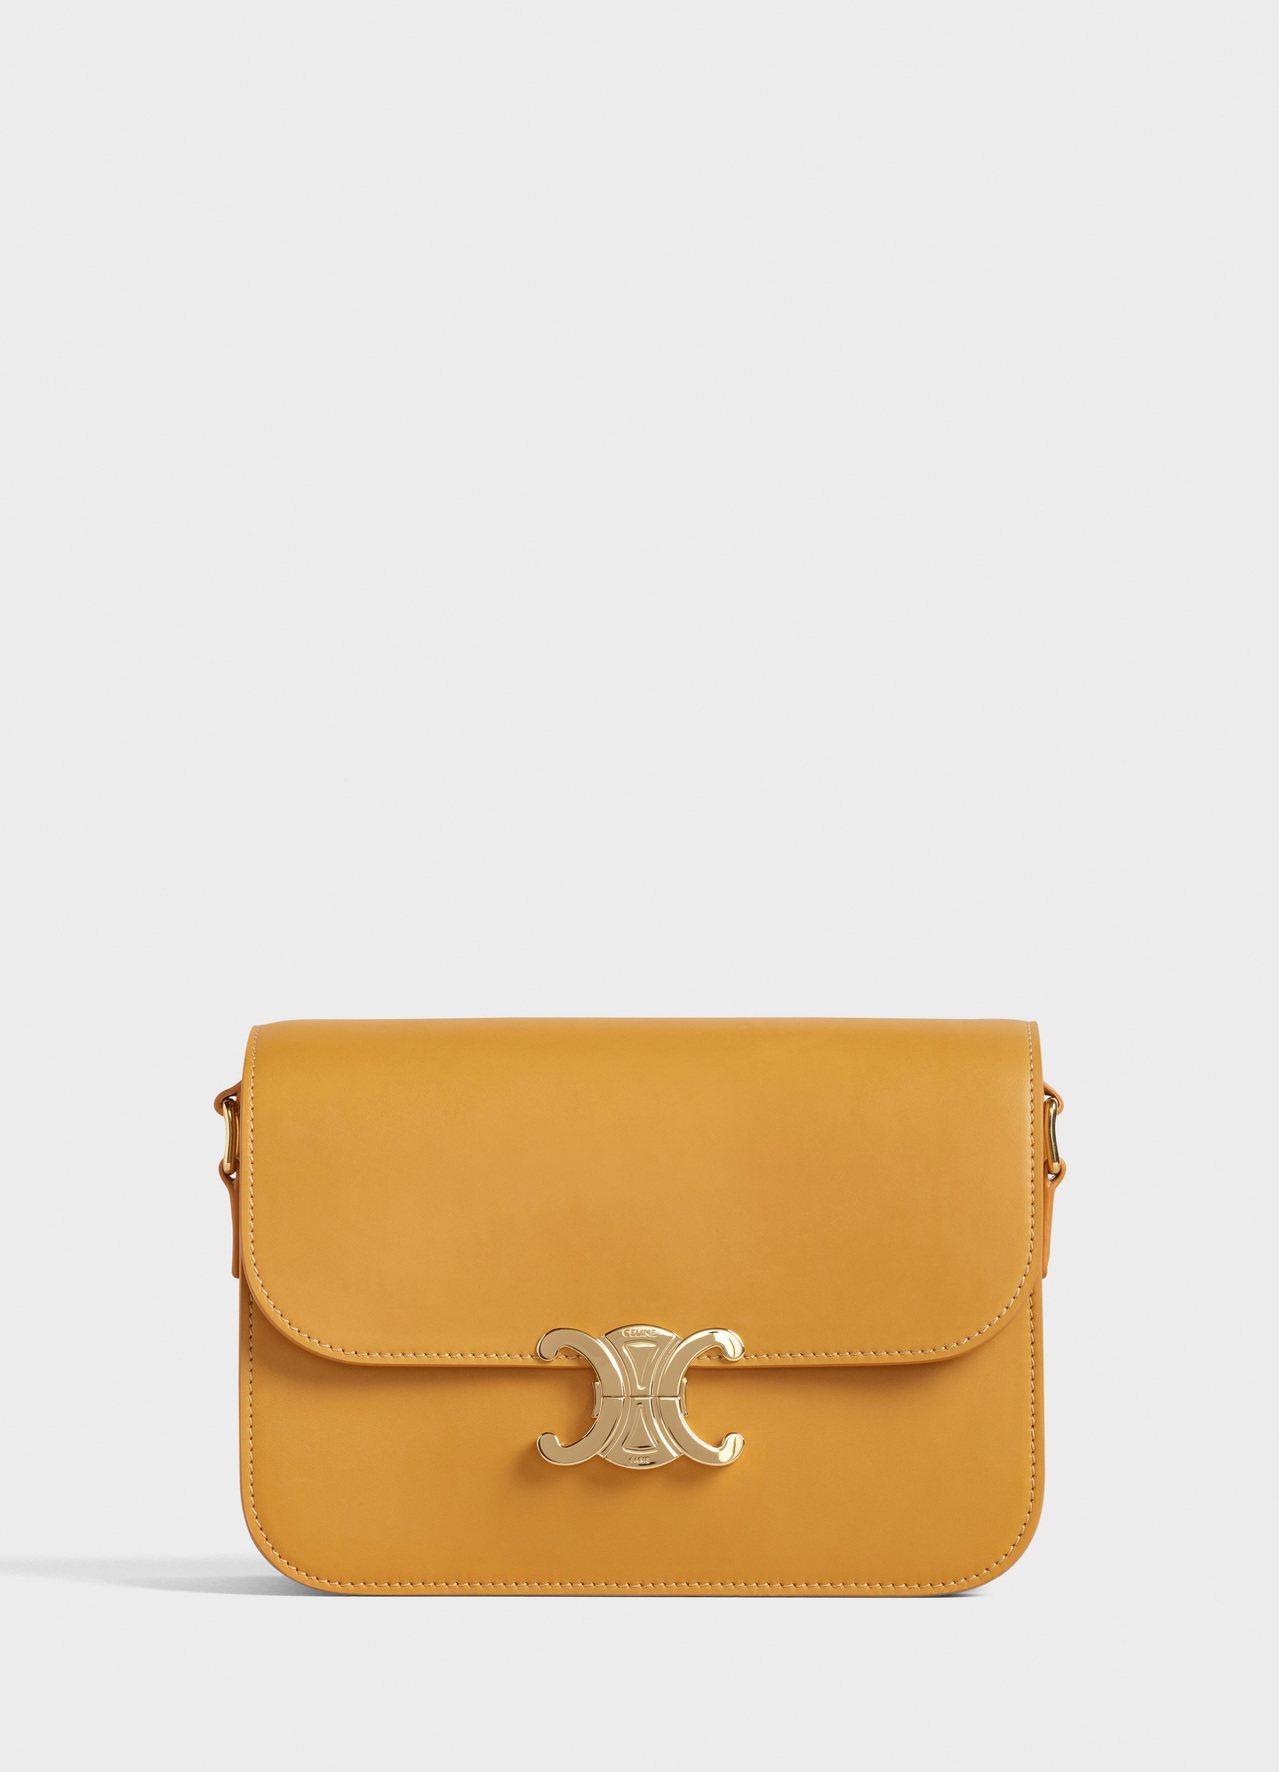 Triomphe赭黃色小牛皮中型肩背包,售價11萬5,000元。圖/CELINE...